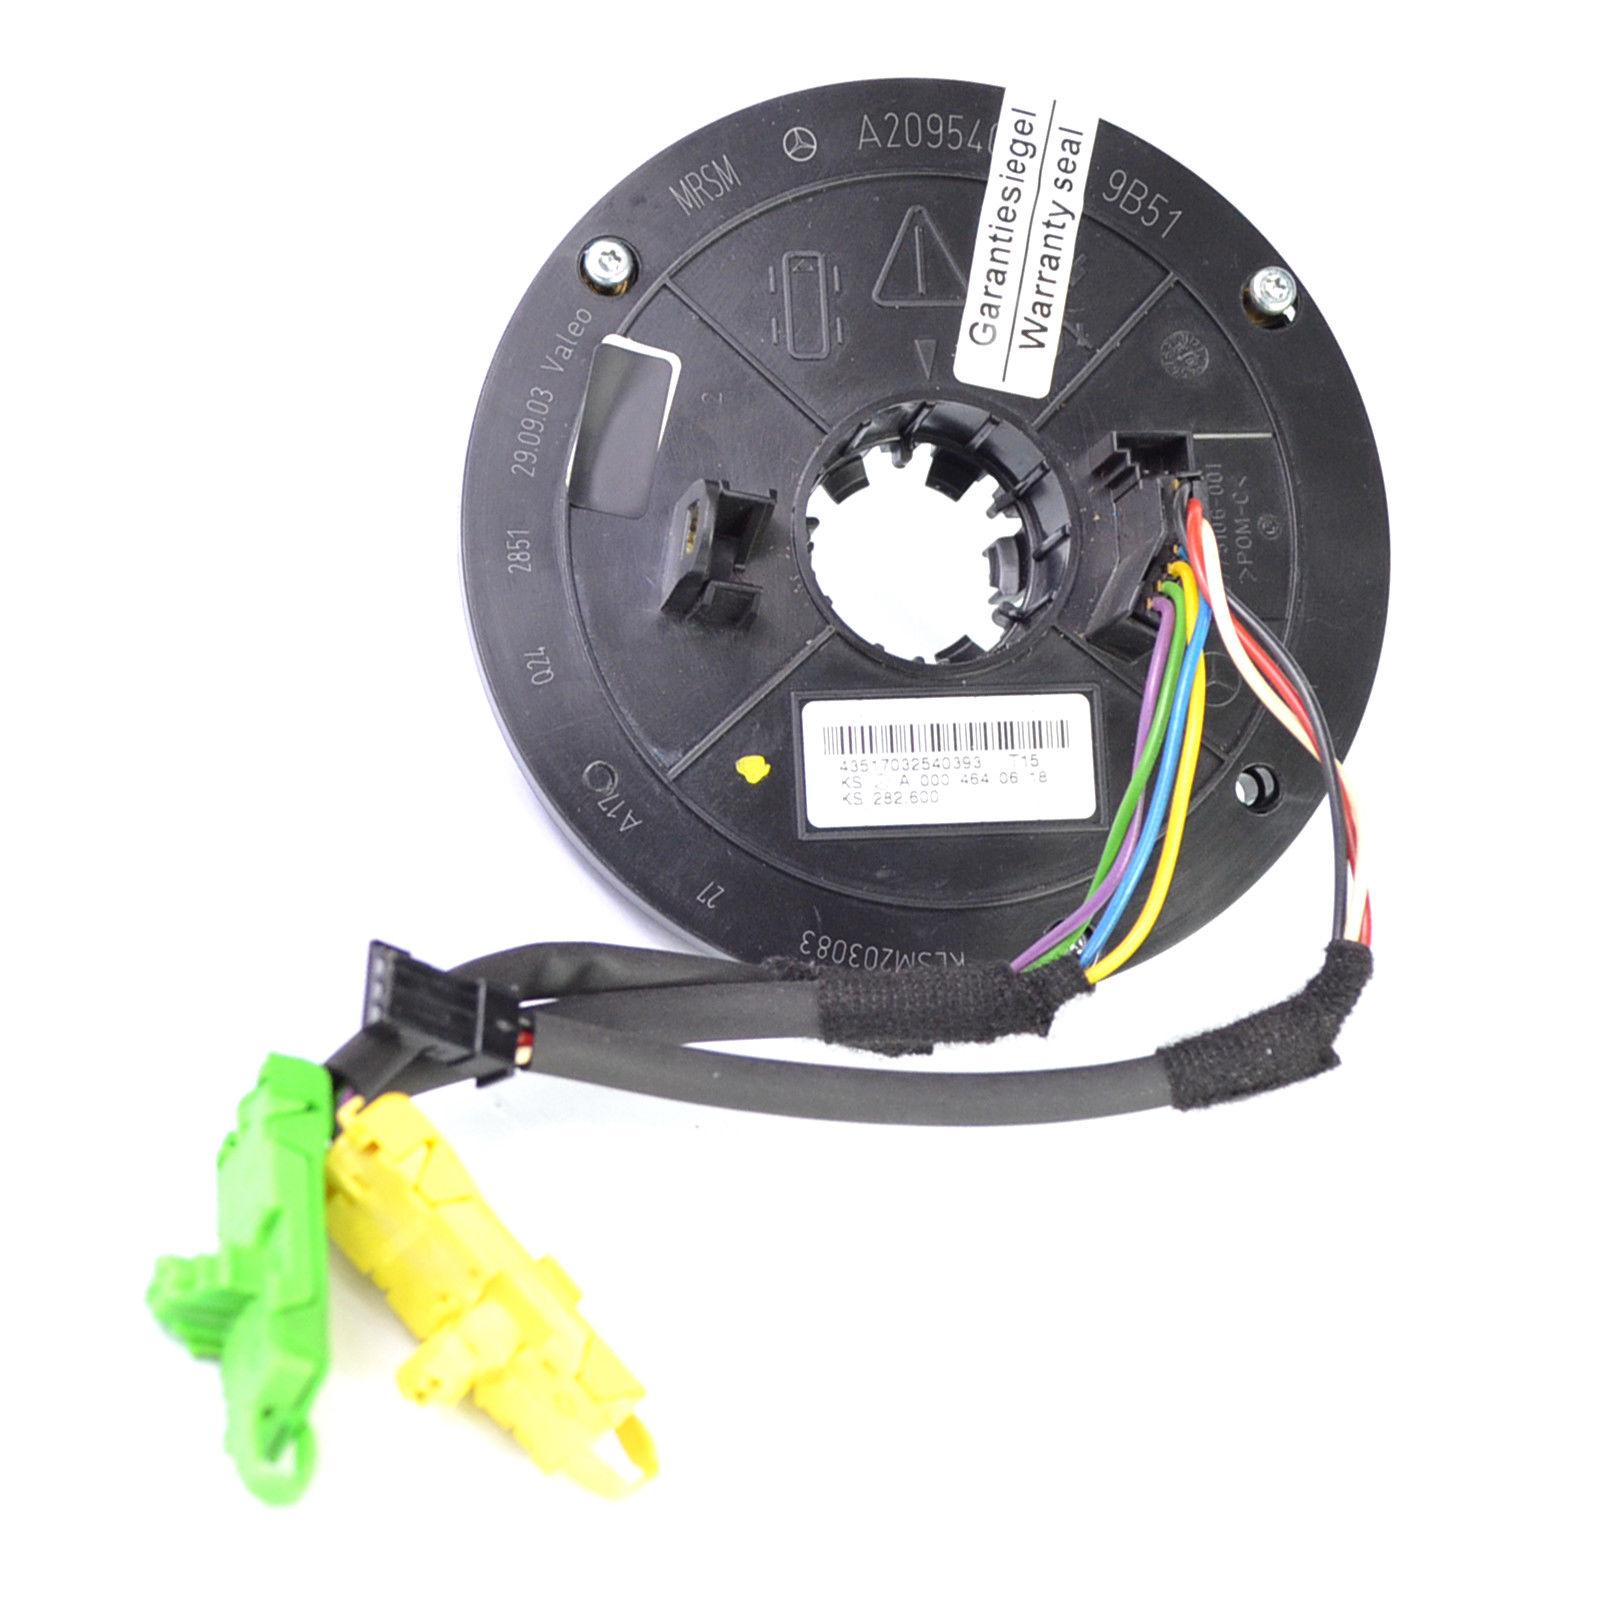 MB R170 Schleifring 0025426518 Lenkwinkelsensor Wickelfeder ohne Multifunktion